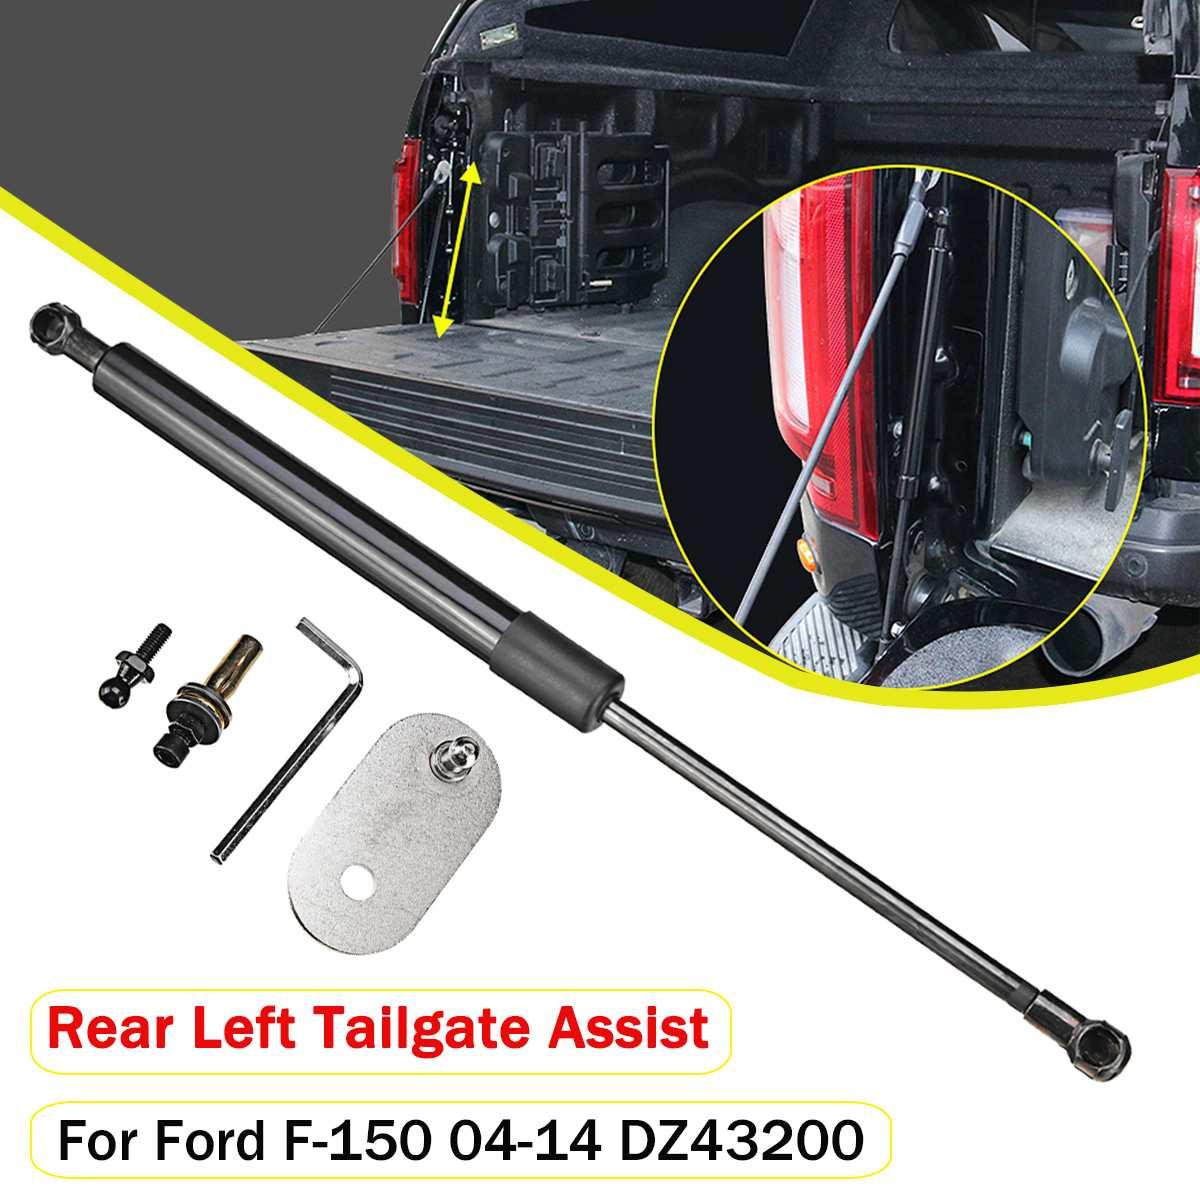 1 set 뒷 트렁크 테일 게이트 유압로드 충격 리프트 스트럿츠 지원 암 바 dz43200 for ford f150 2004 2005 2006 2007 2008-2014